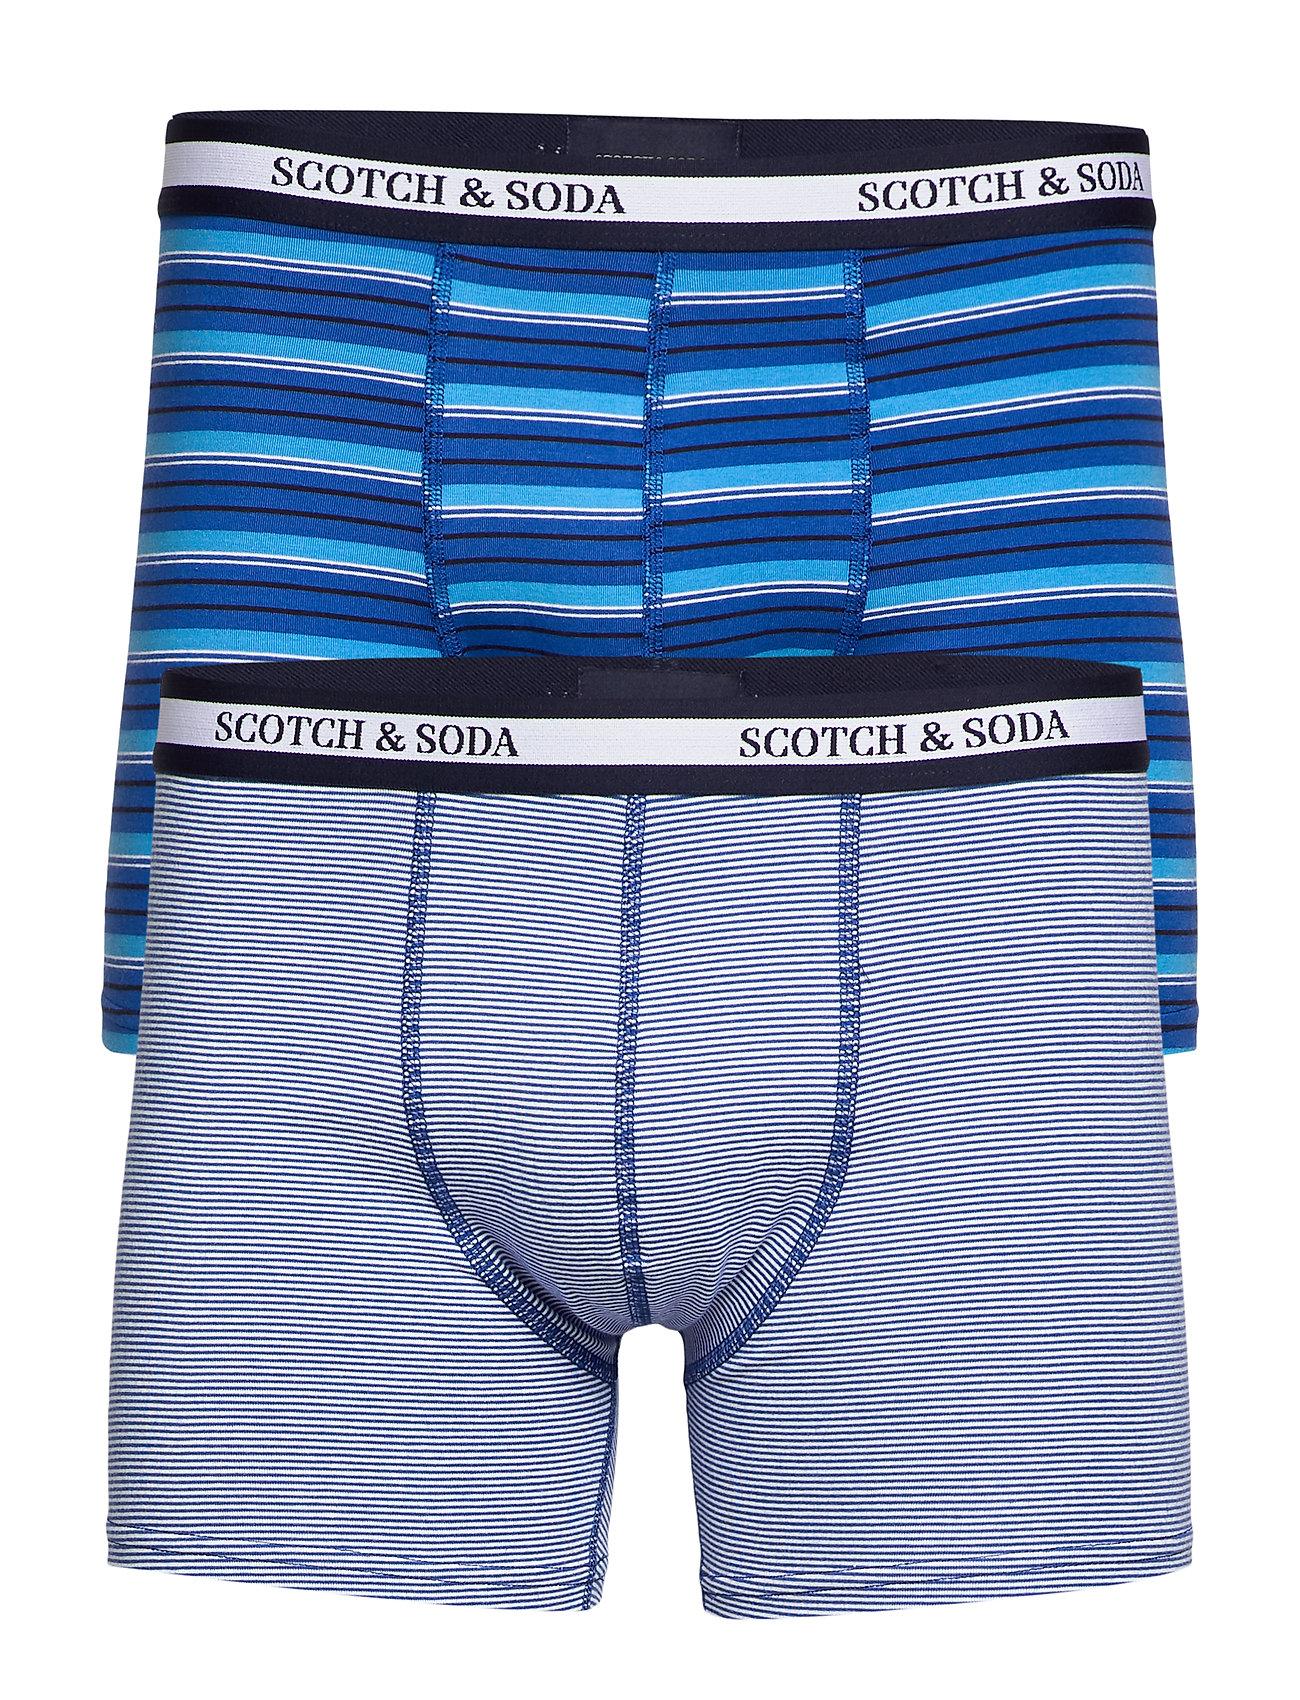 Scotch & Soda Jersey boxer shorts in yarn-dyed stripe - COMBO A